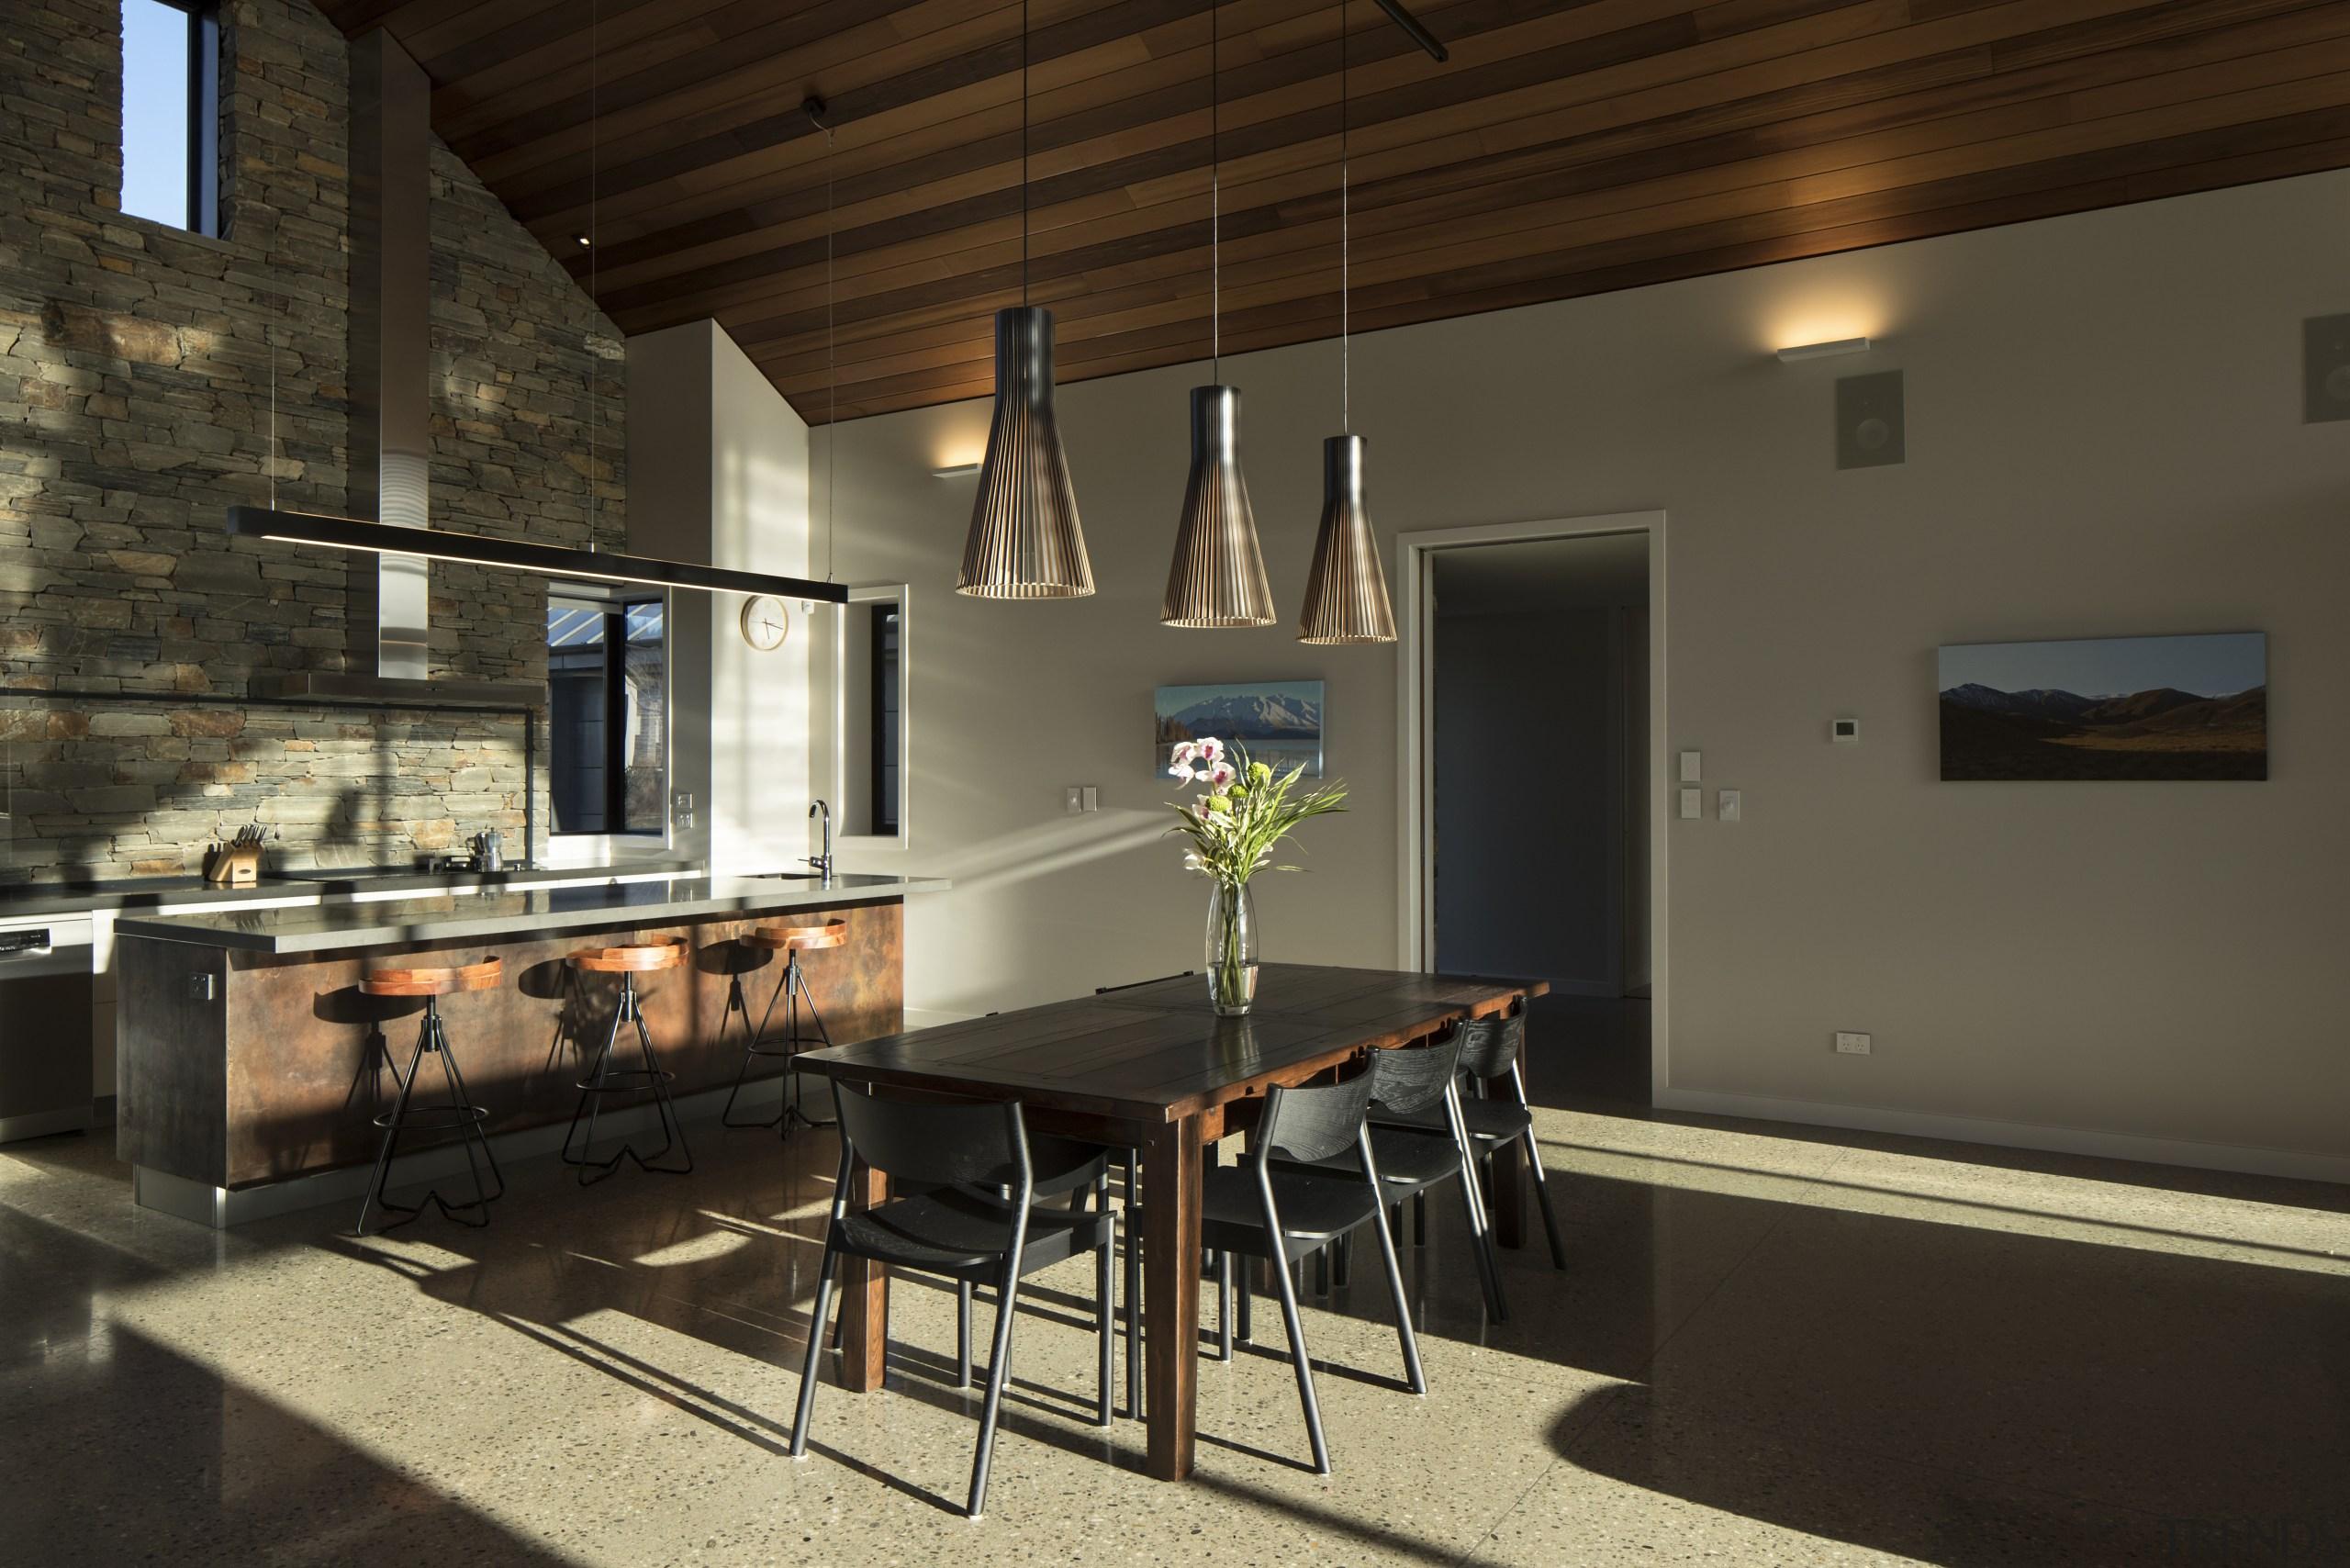 This kitchen – in a new home by architecture, floor, furniture, home, house, interior design, Kitchen, Schist Wall, plashback, Condon Scott Architects